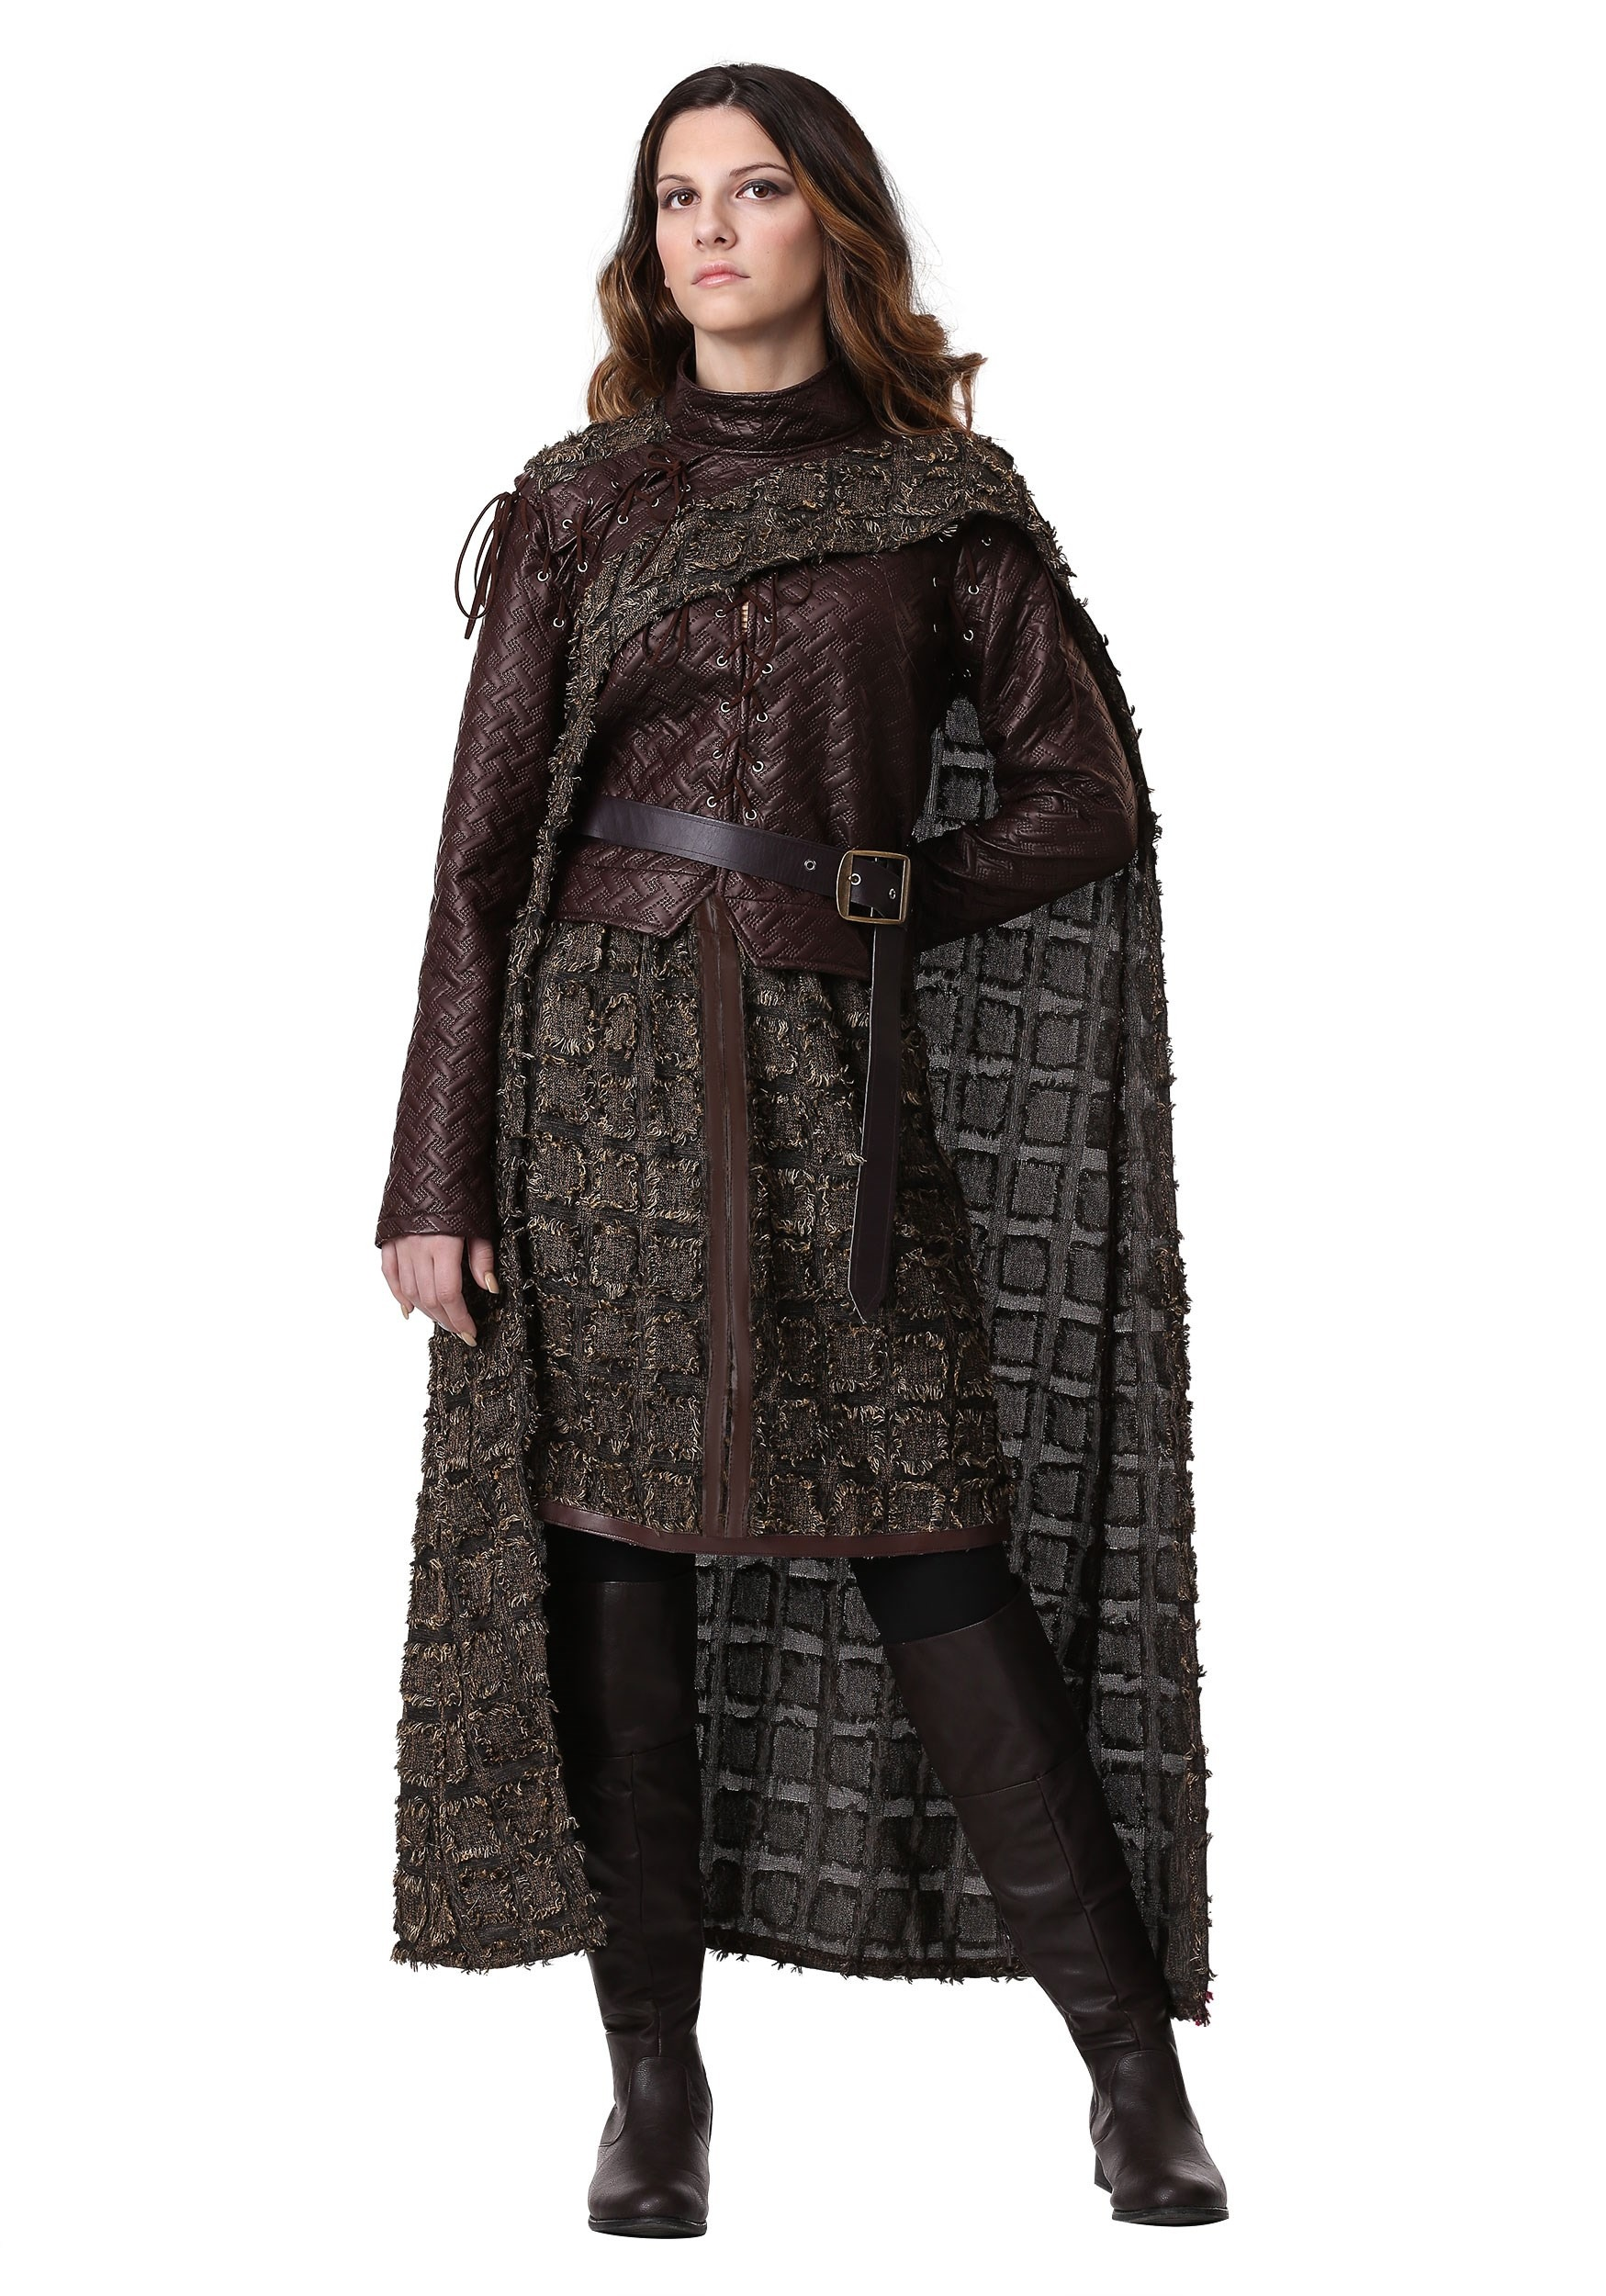 Winter Warrior Costume for Women | Exclusive W/ Cape & Jacket